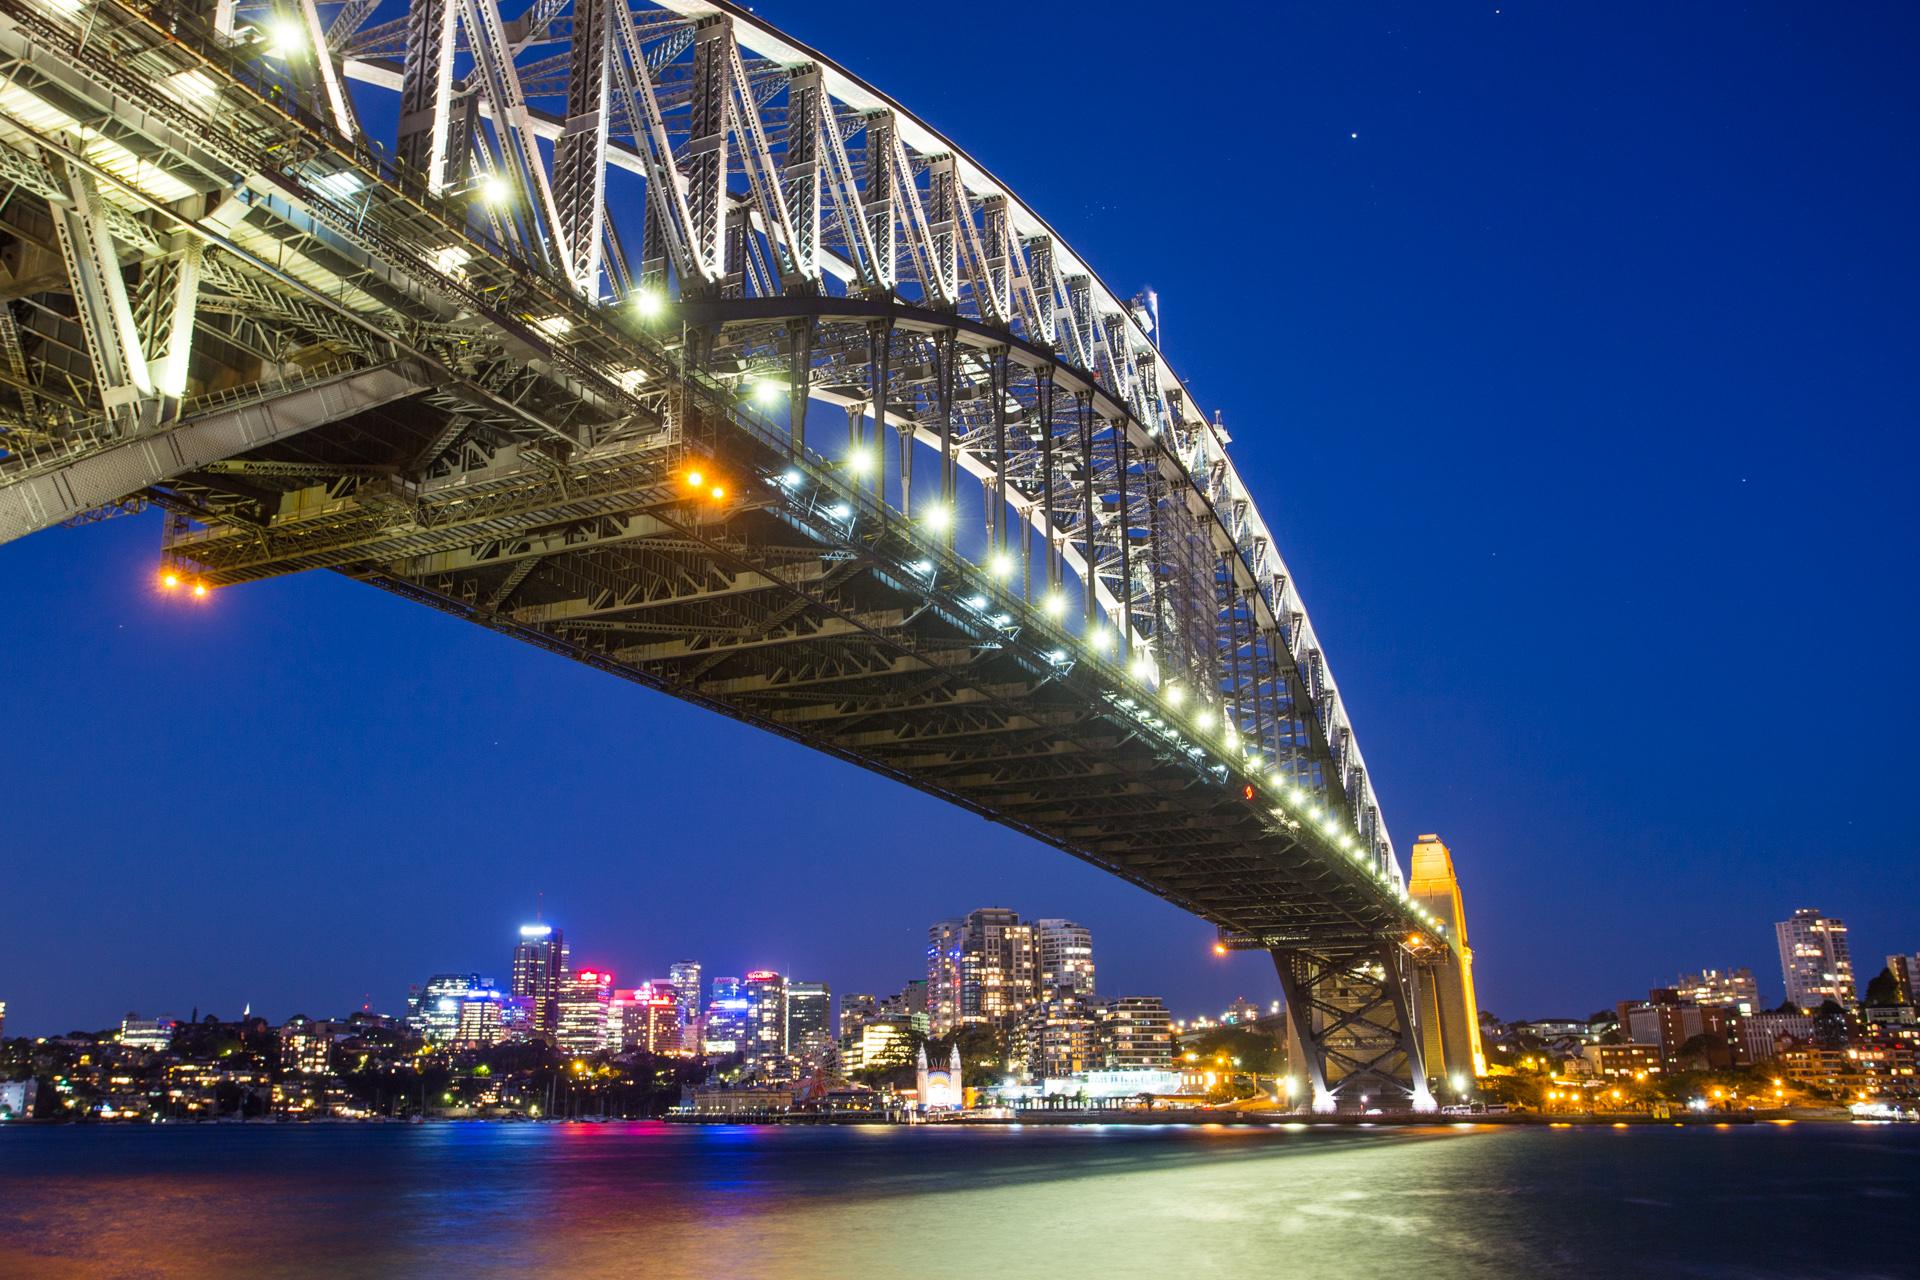 100 free online dating australia in Sydney